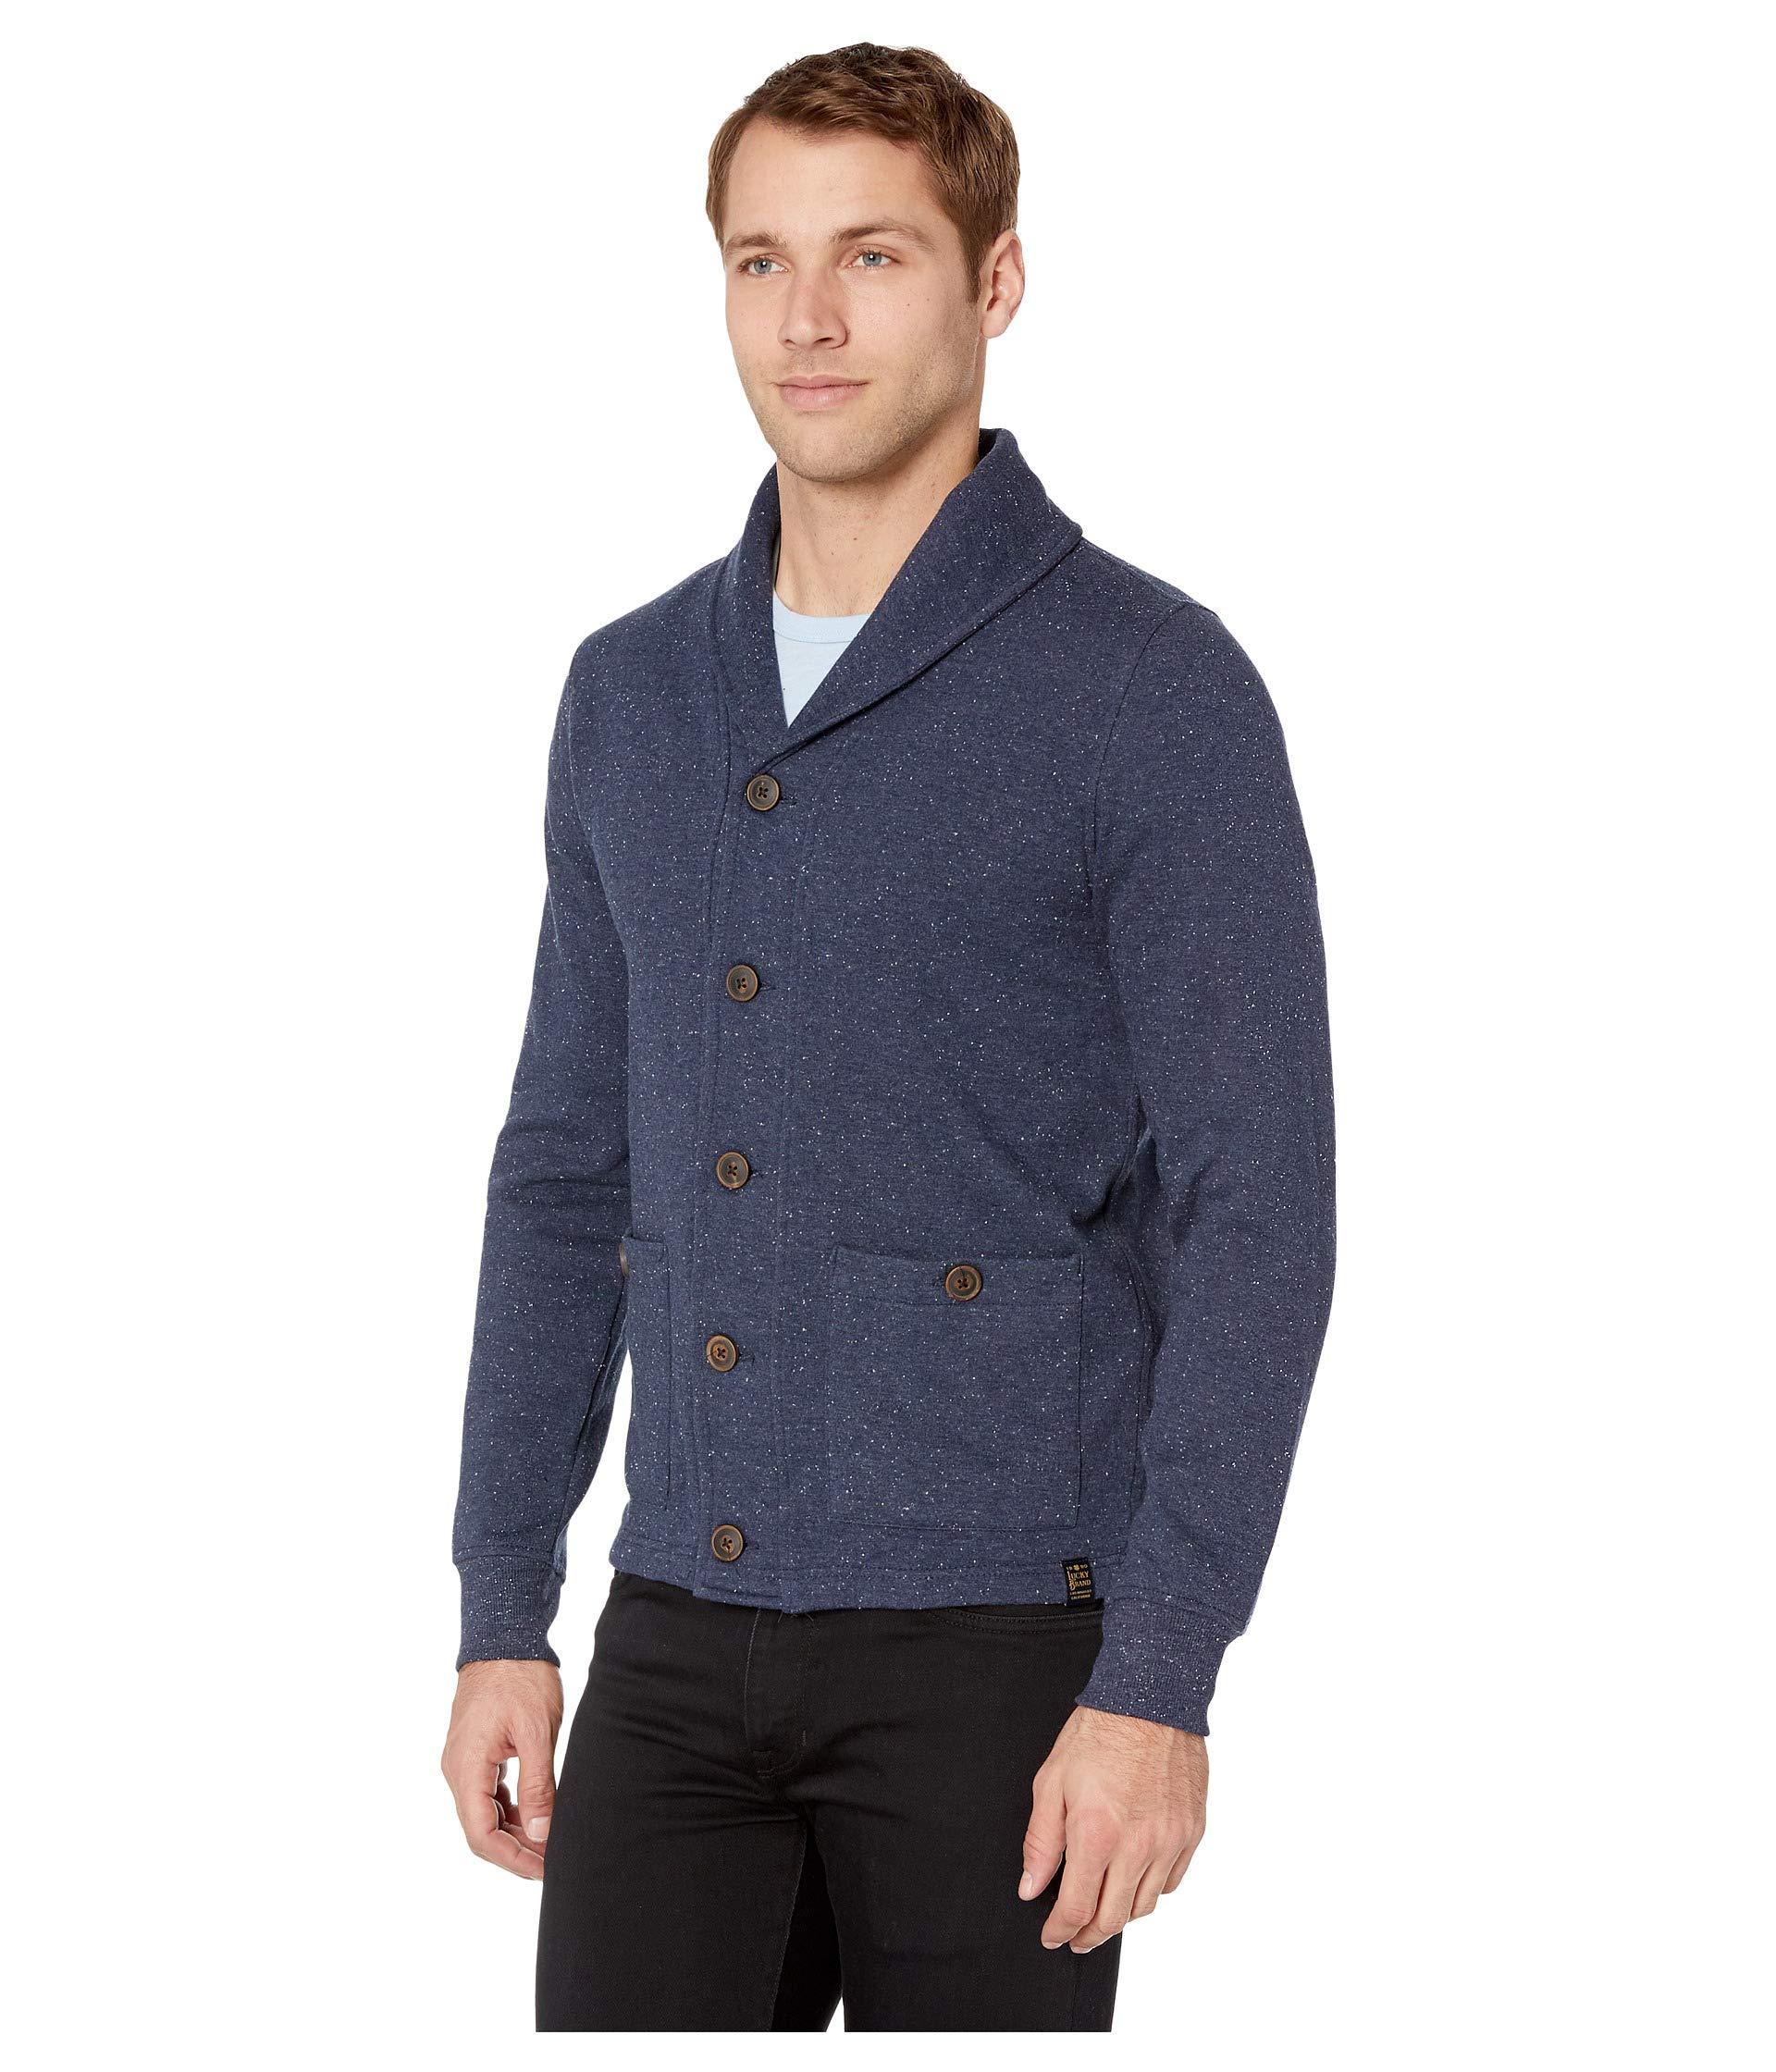 Shawl Sweatshirt Navy Cardigan Lucky Brand pBx4xA